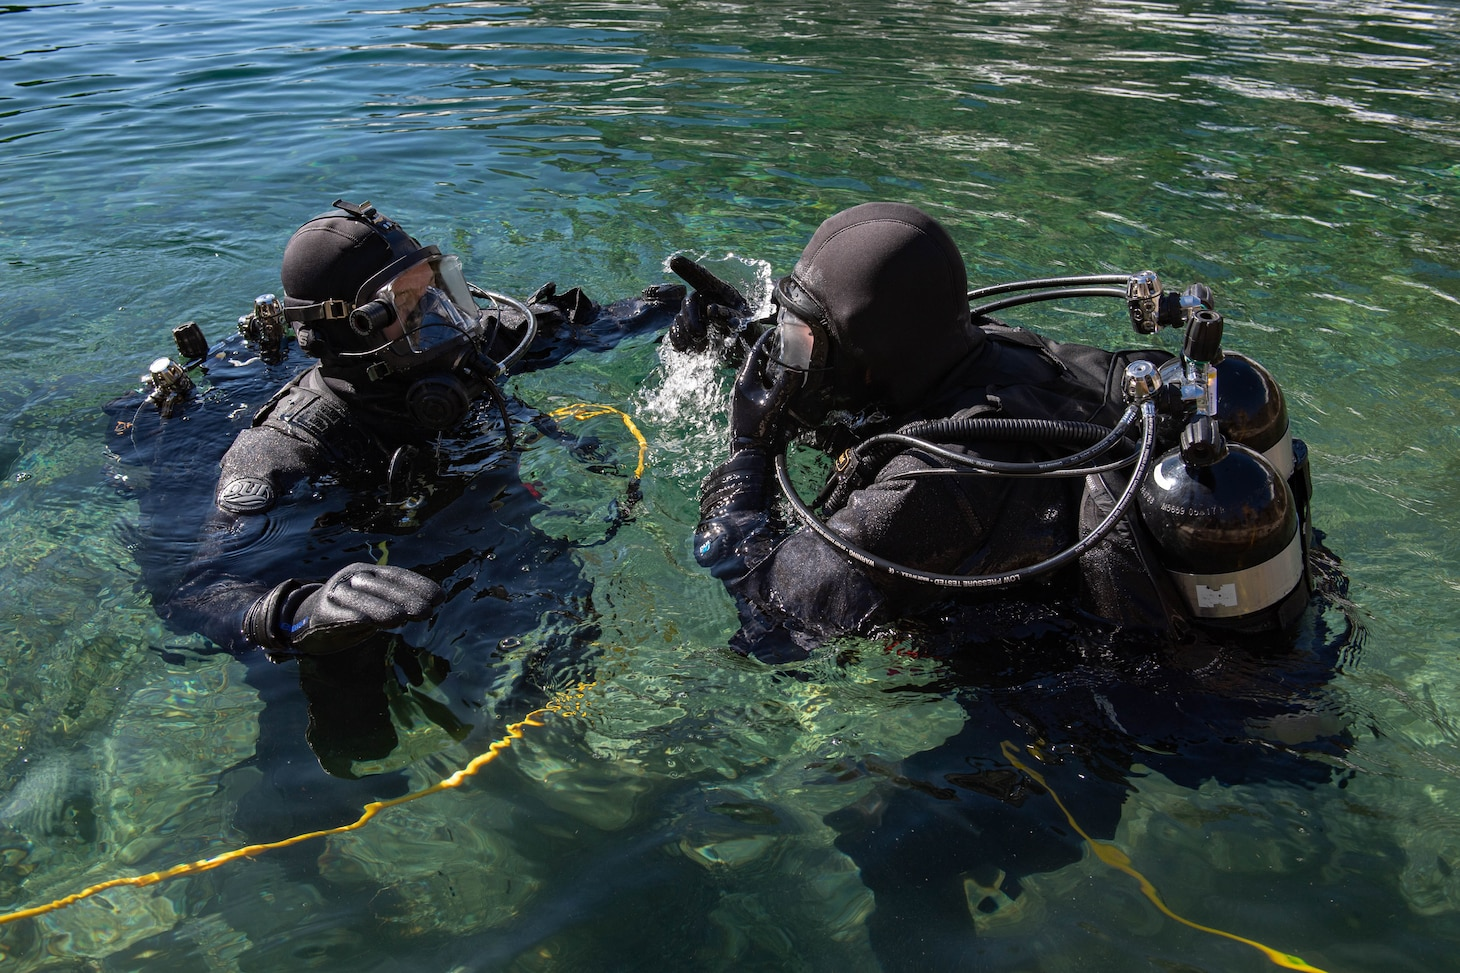 EODMU8; CBA; C6F; CTF68; Divers